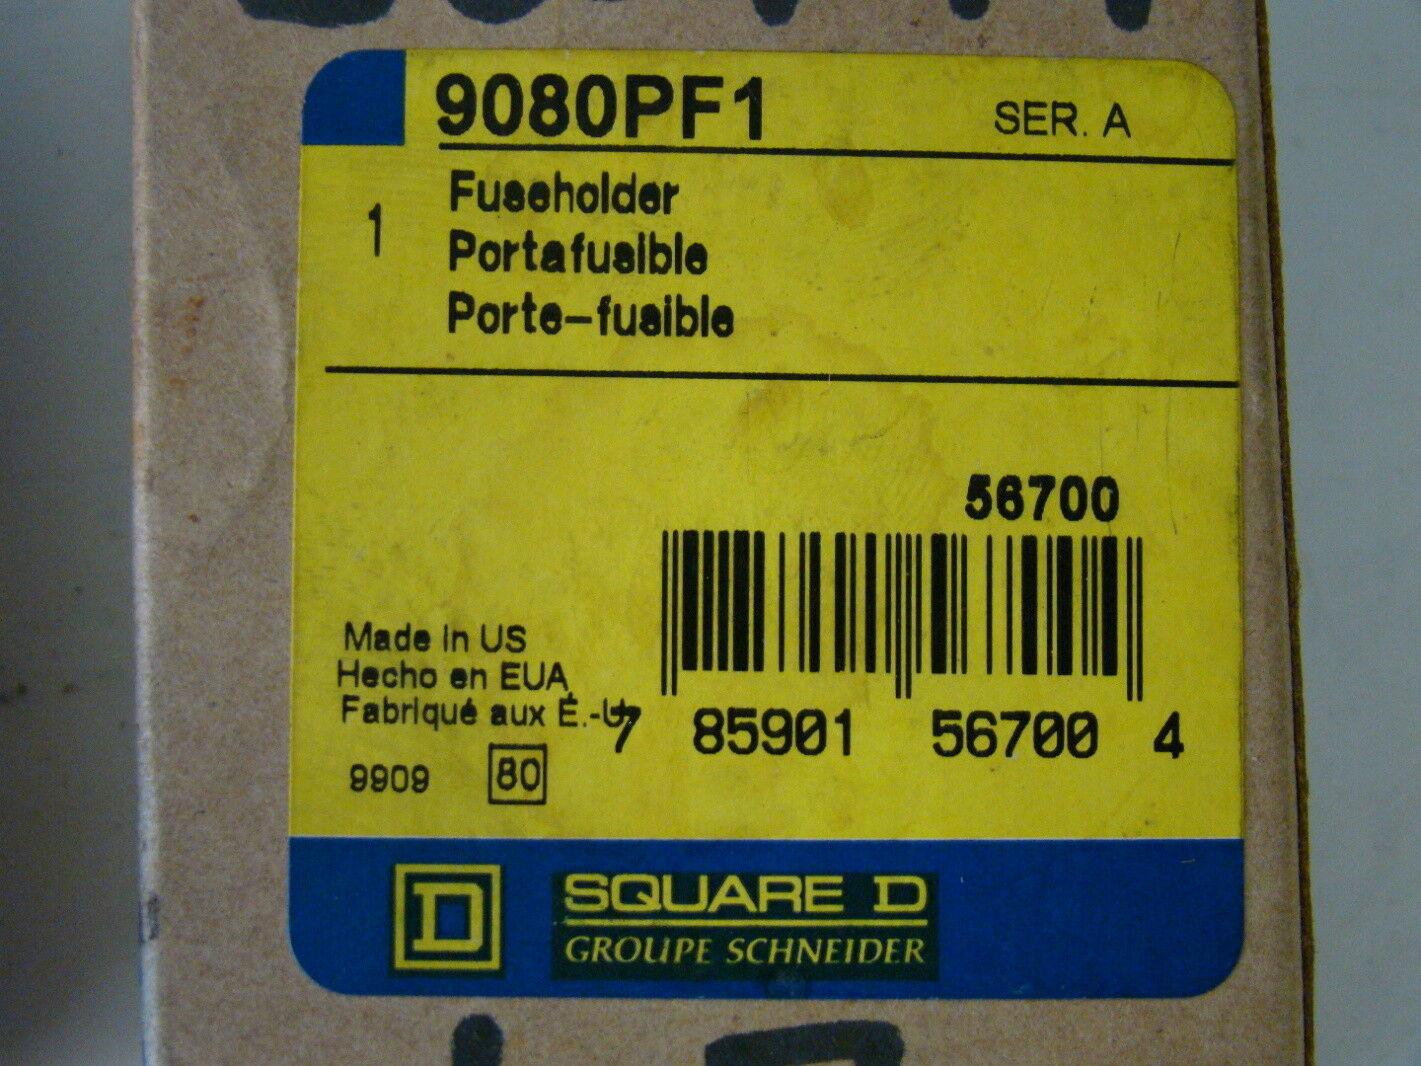 square d fuse box parts square d fuse holder 9080pf1 | ebay d fuse box location